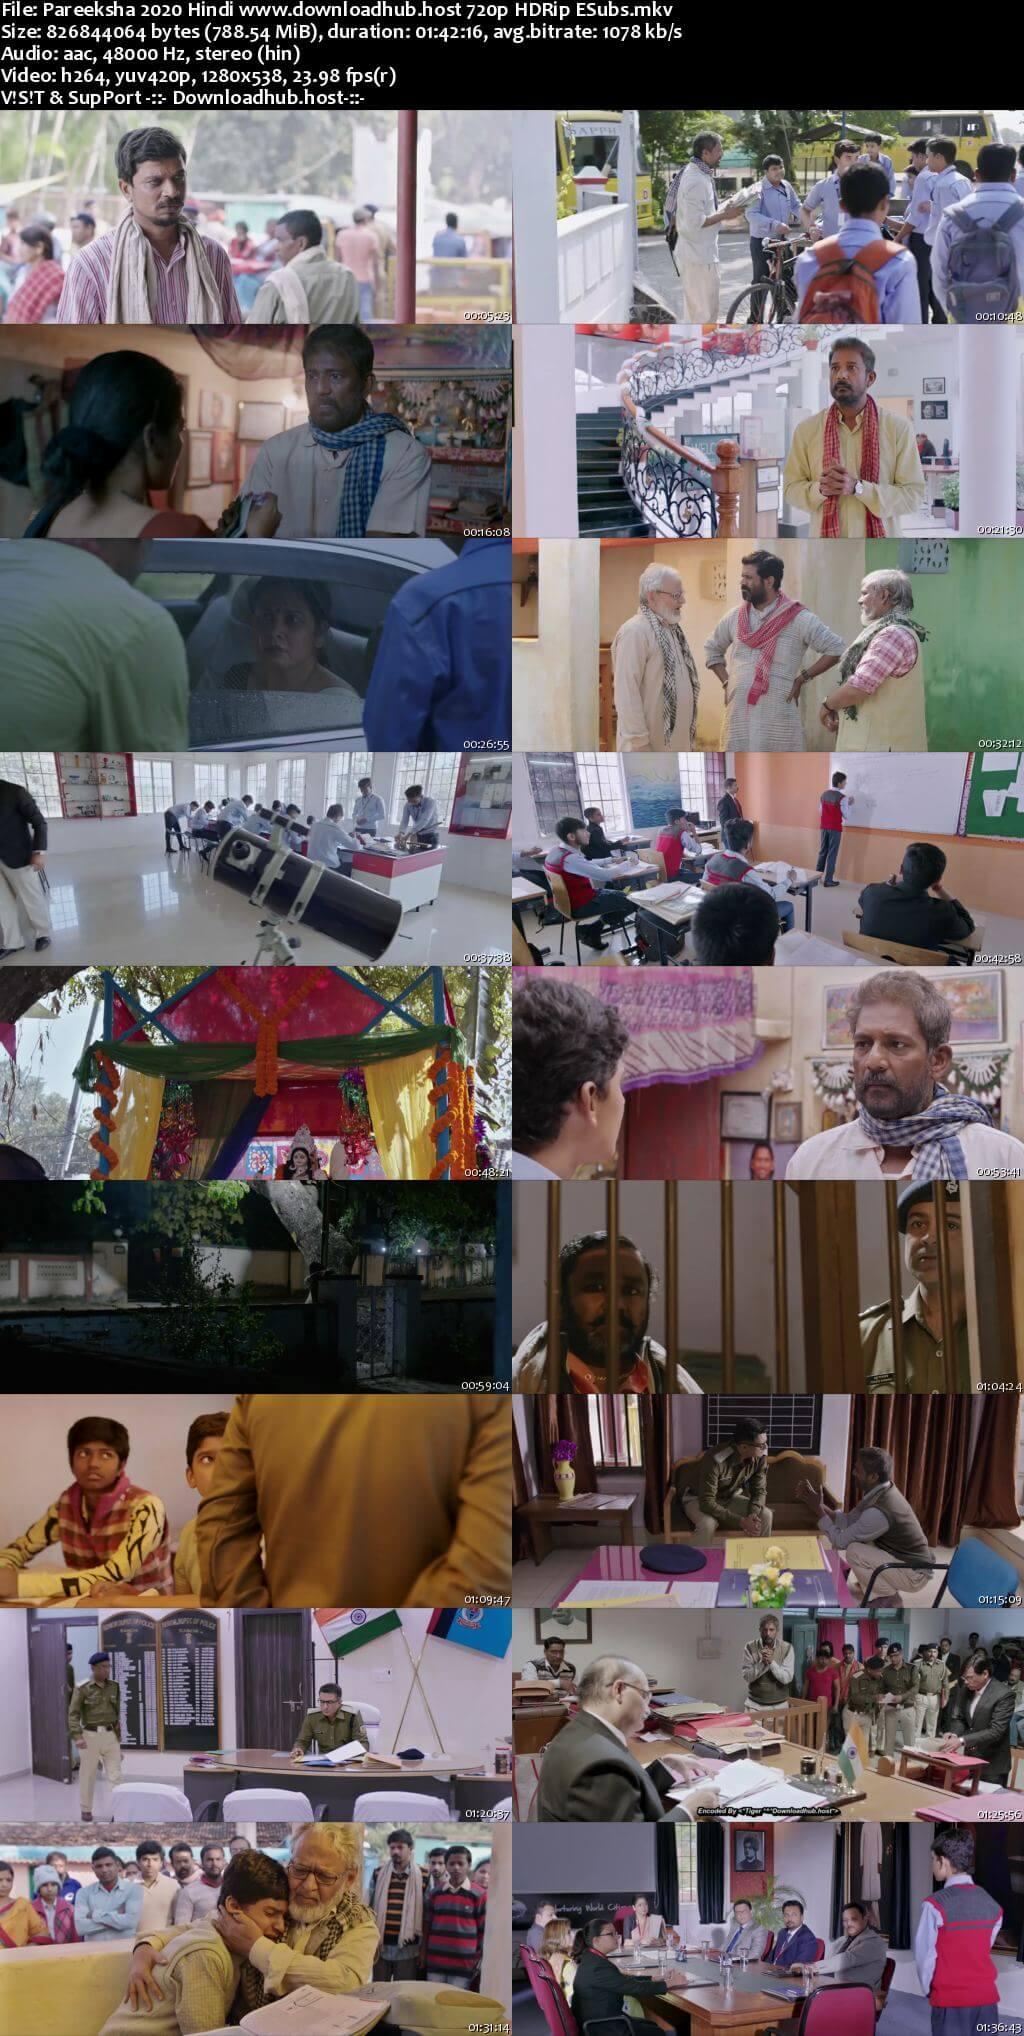 Pareeksha 2020 Hindi 720p HDRip ESubs